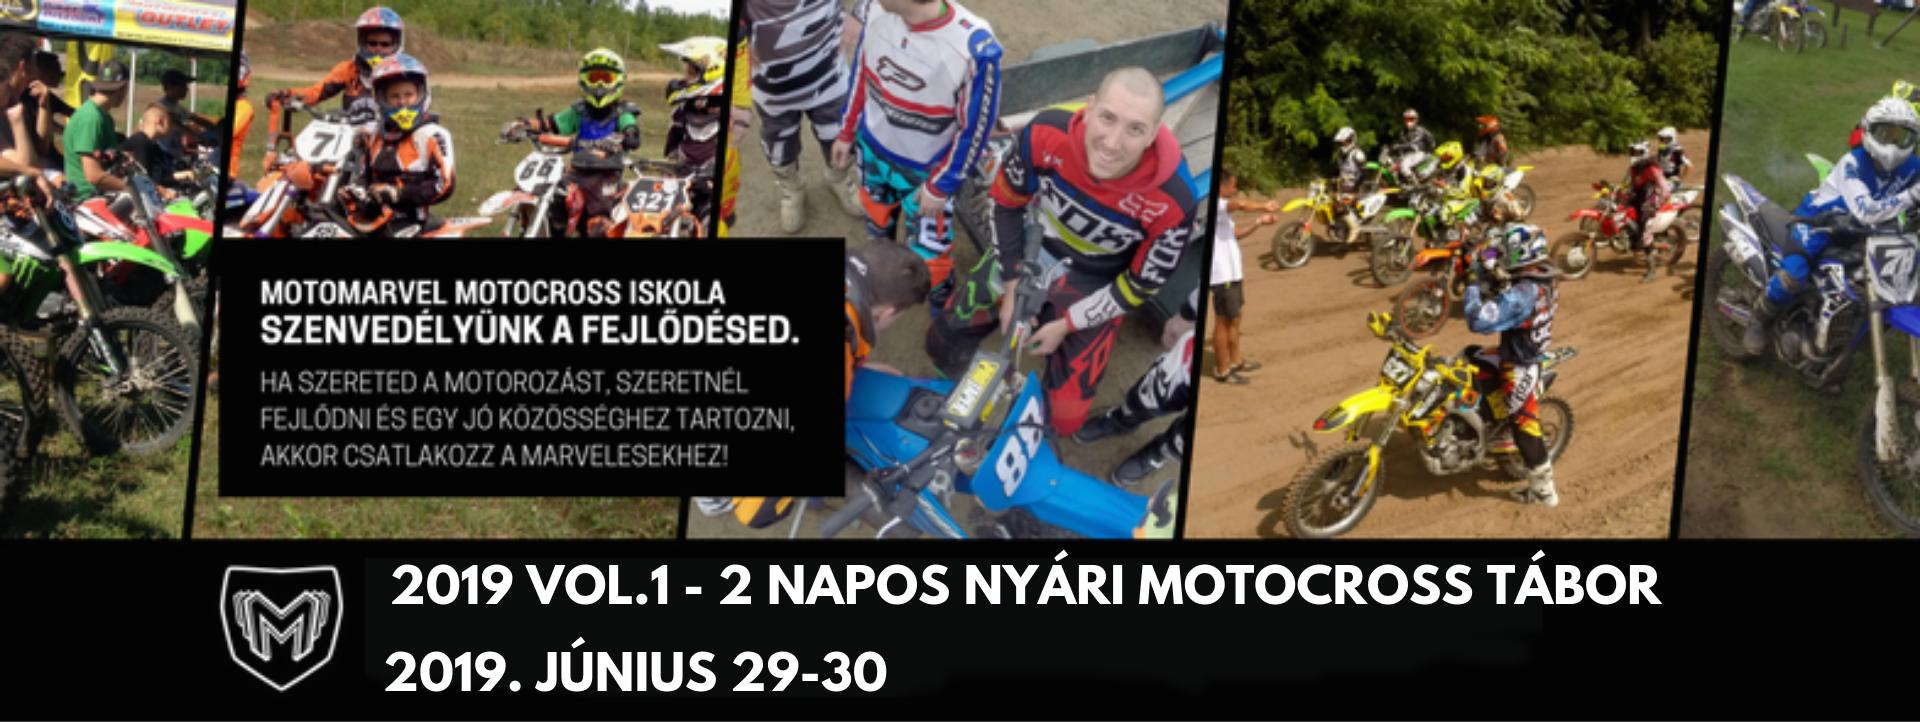 2019 VOL.1 - 2 NAPOS NYÁRI MOTOCROSS TÁBOR.png